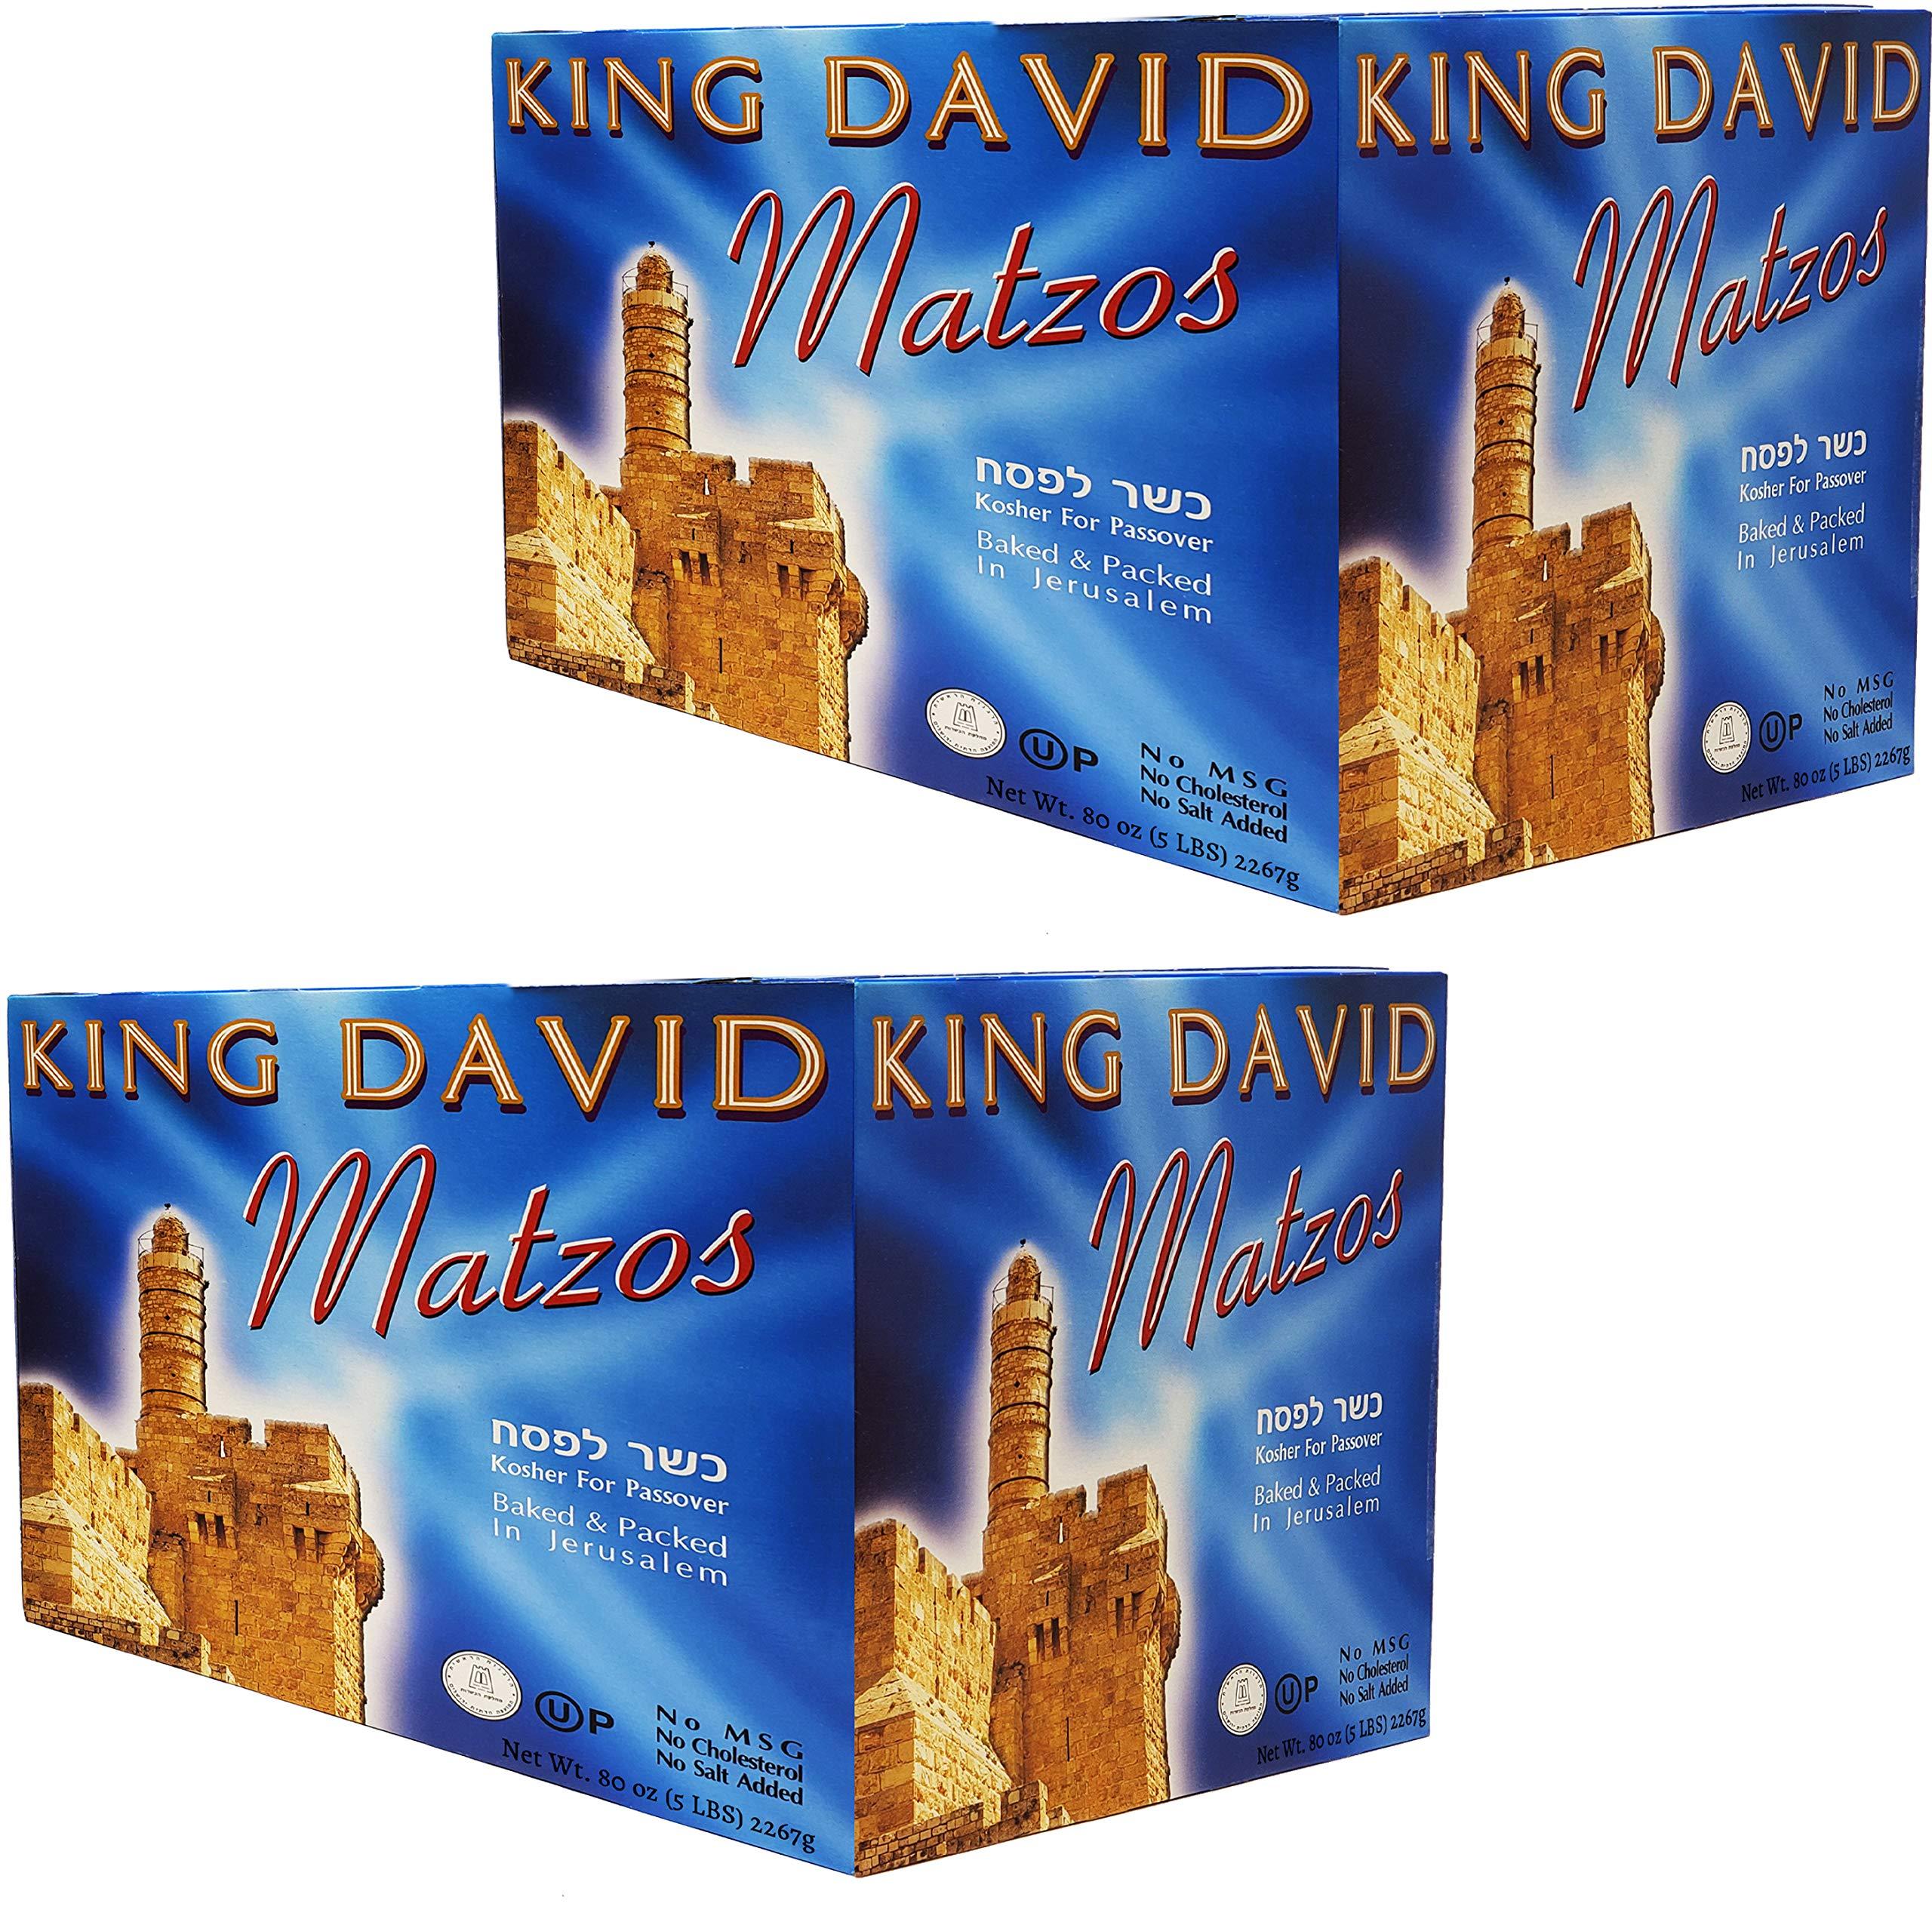 Matzo Passover Matzah Israeli Kosher For Passover King David Matzos Ten Individual One Pound Boxes (Total of 10 LBS) by King David